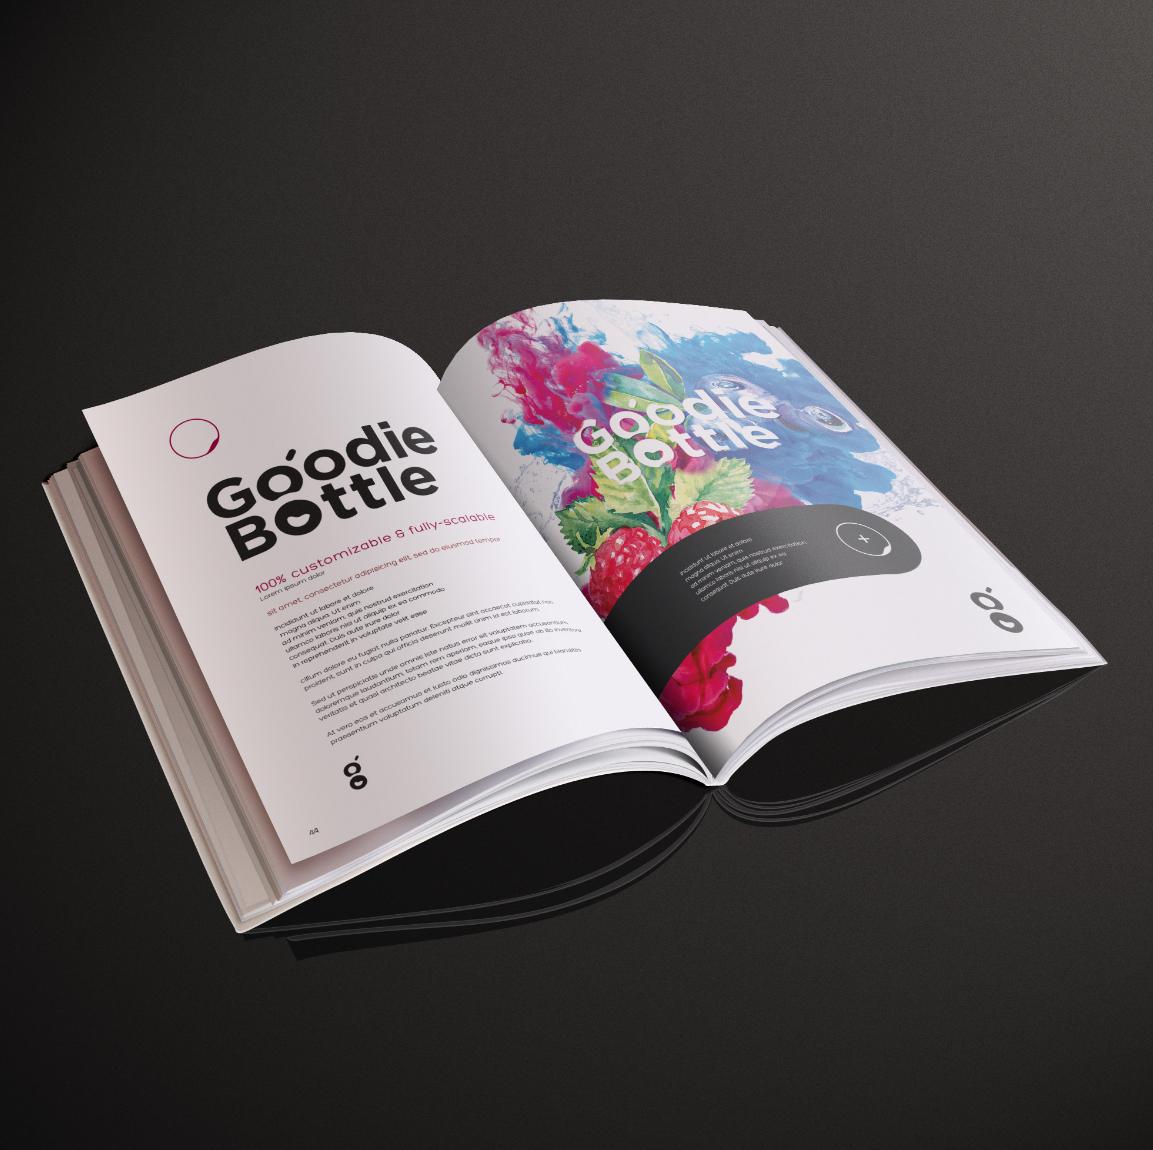 magazine design leamington & warwickshire